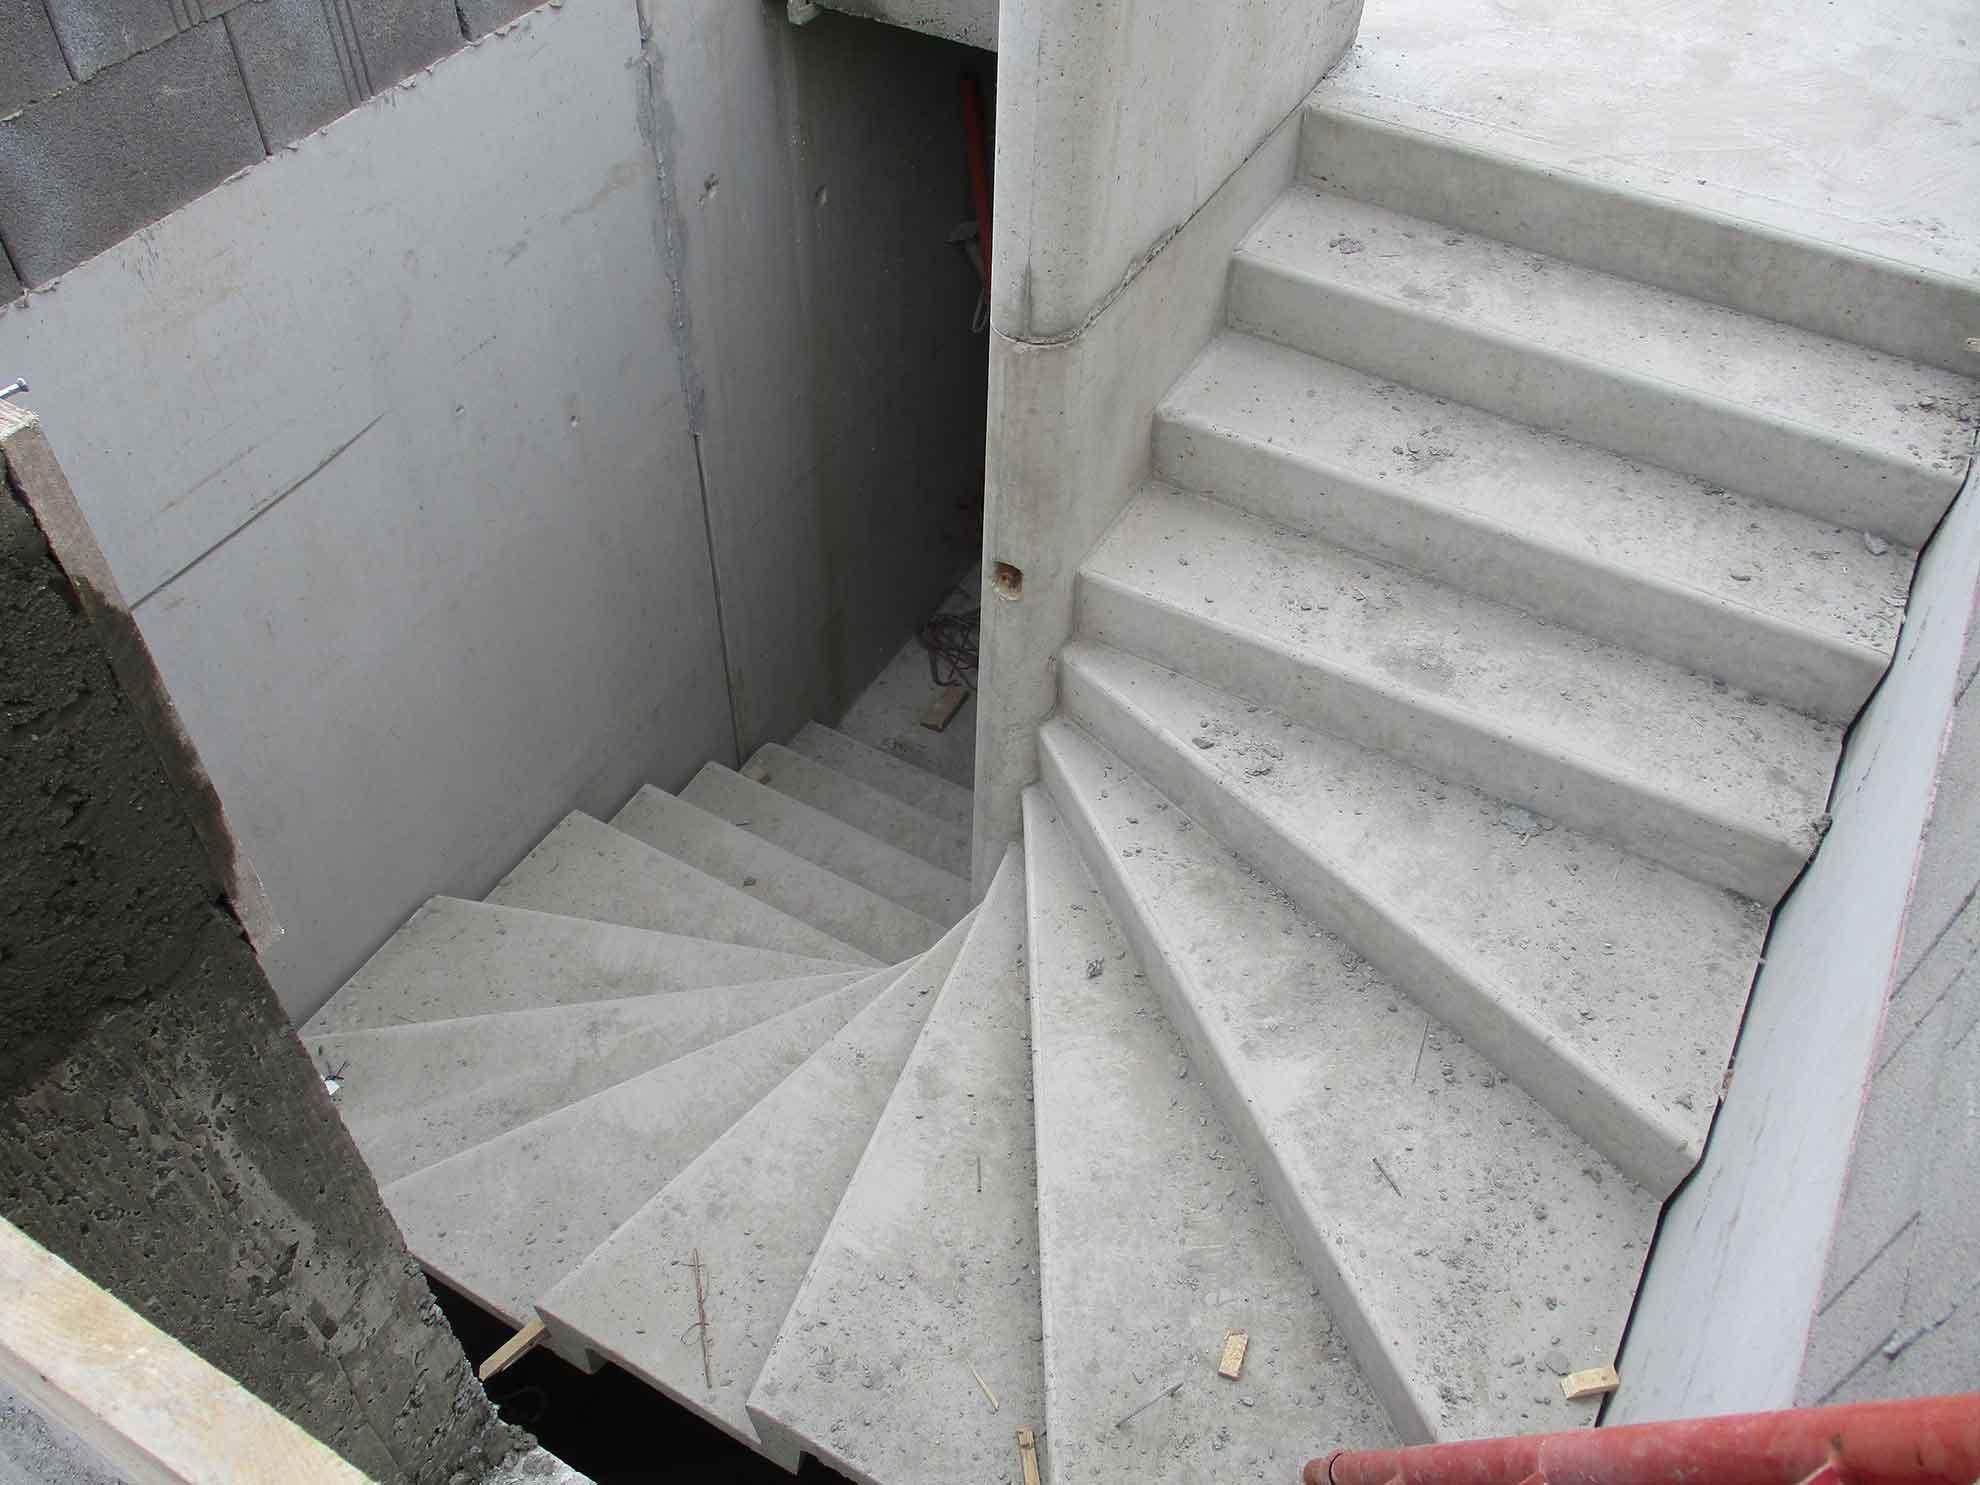 escalier-logement-collectif-beton